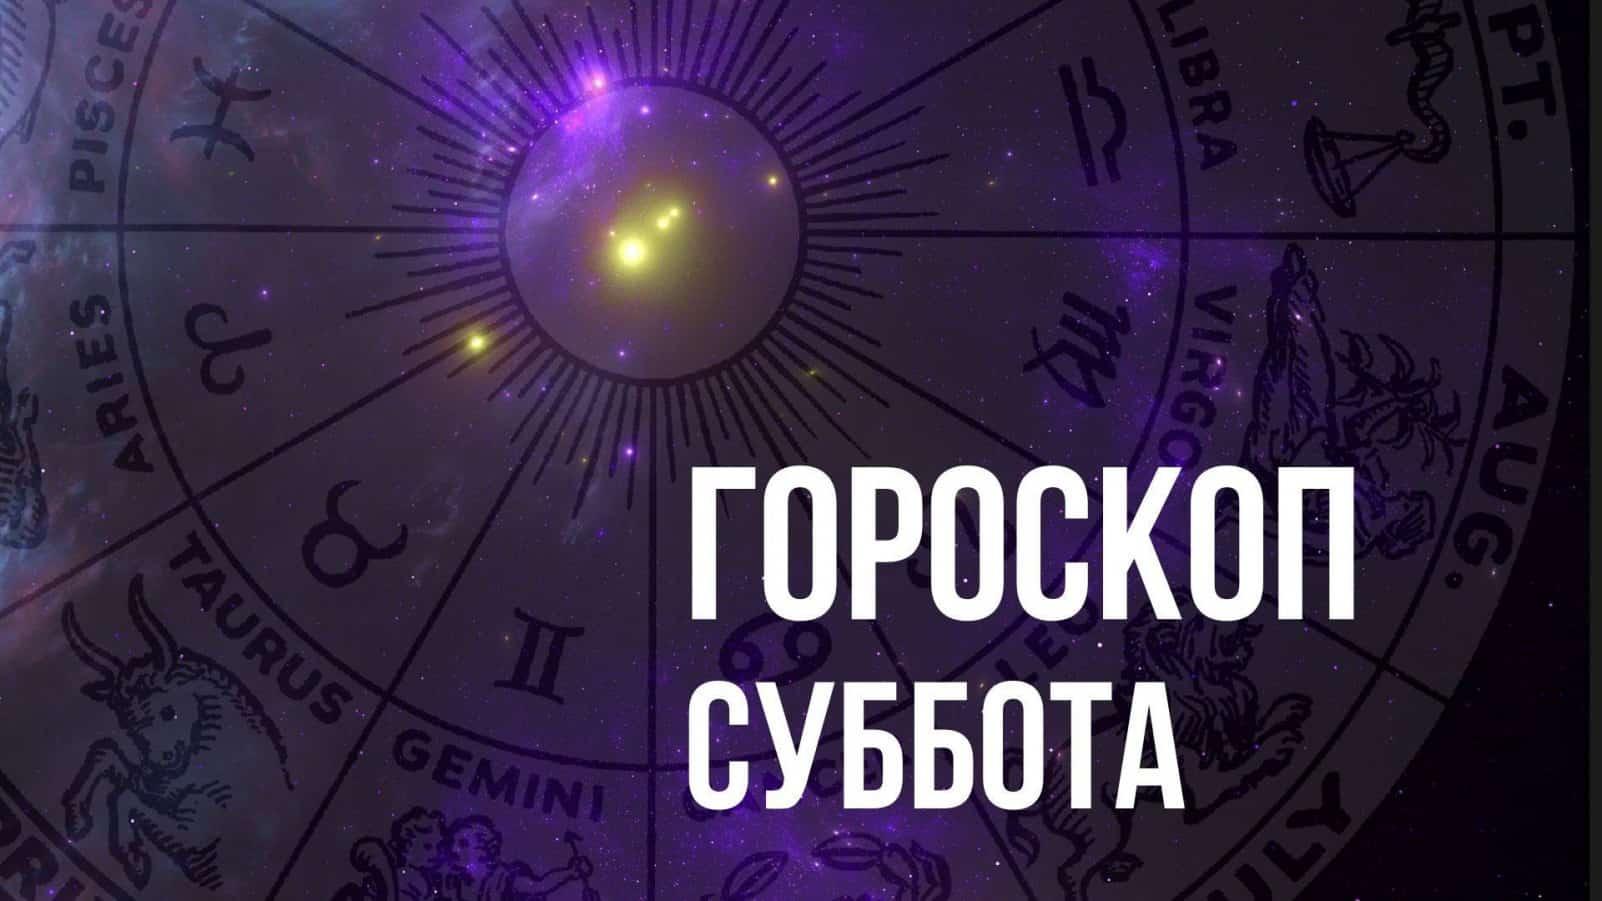 Гороскоп на субботу 6 марта для каждого знака Зодиака